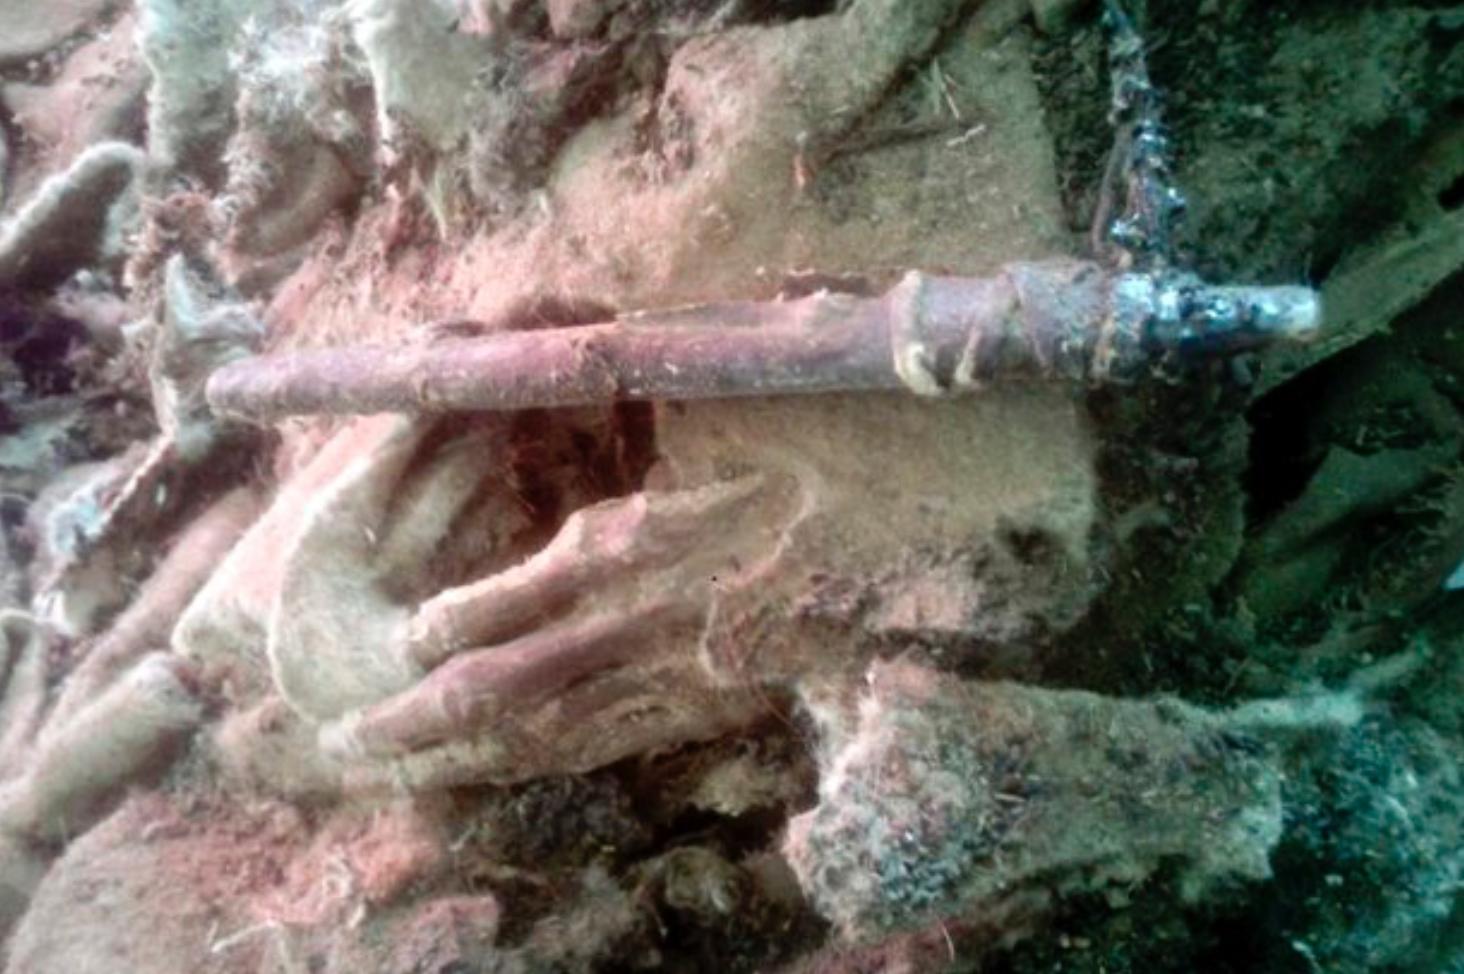 Mummy's Hands